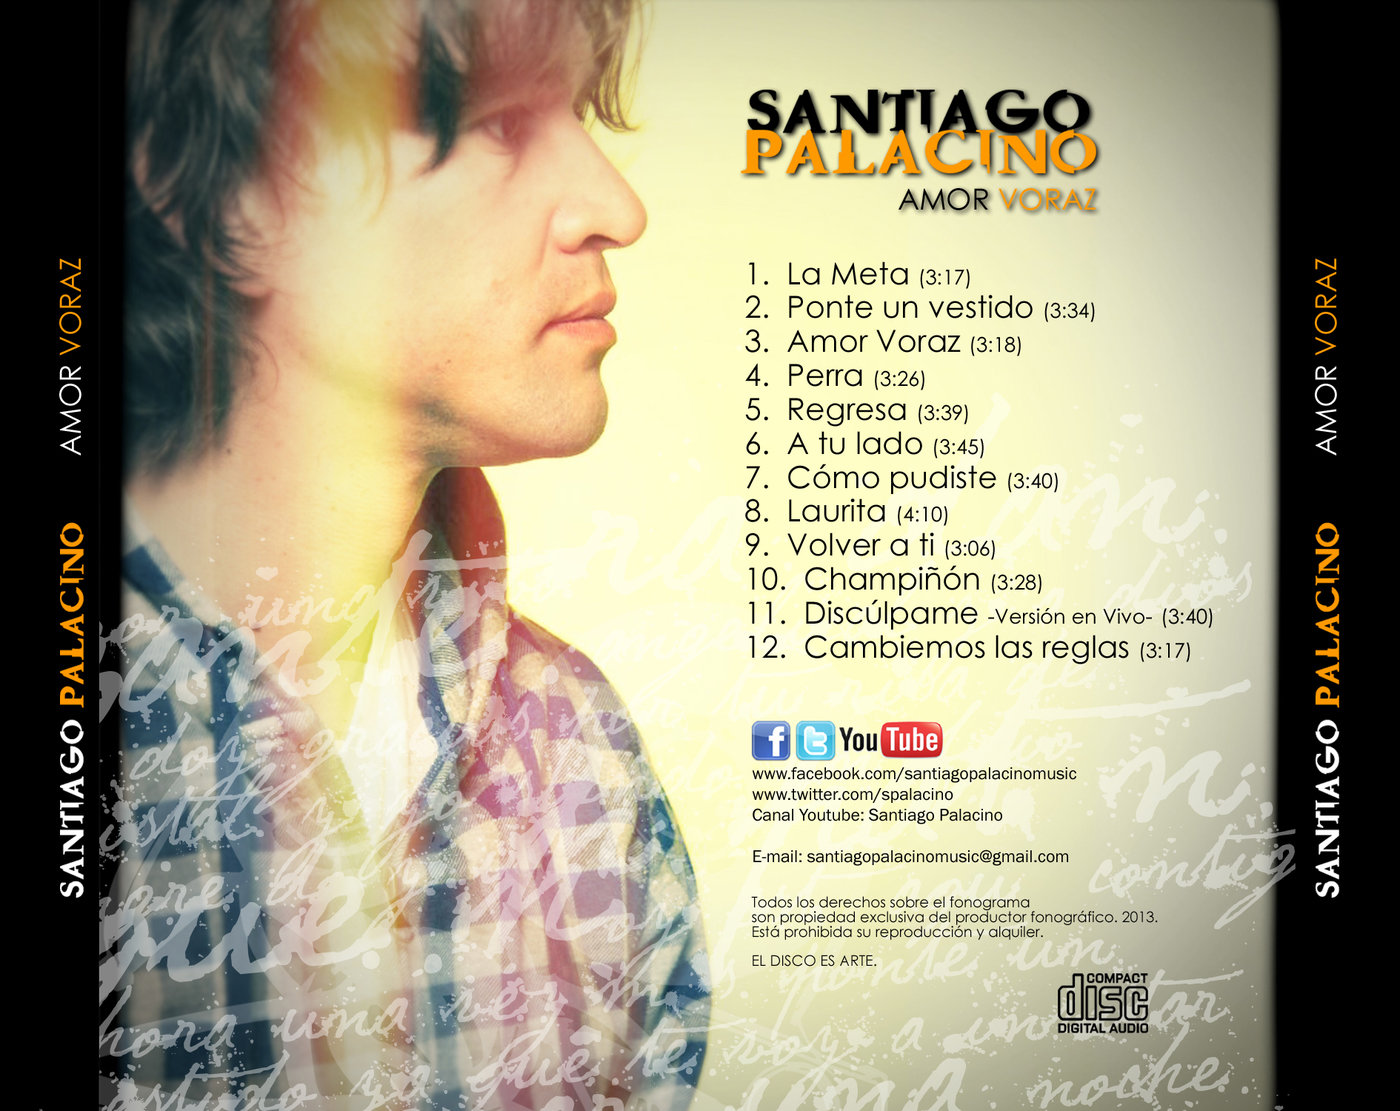 Amor Voraz santiago palacino cd 2013hernán d. alvarado at coroflot